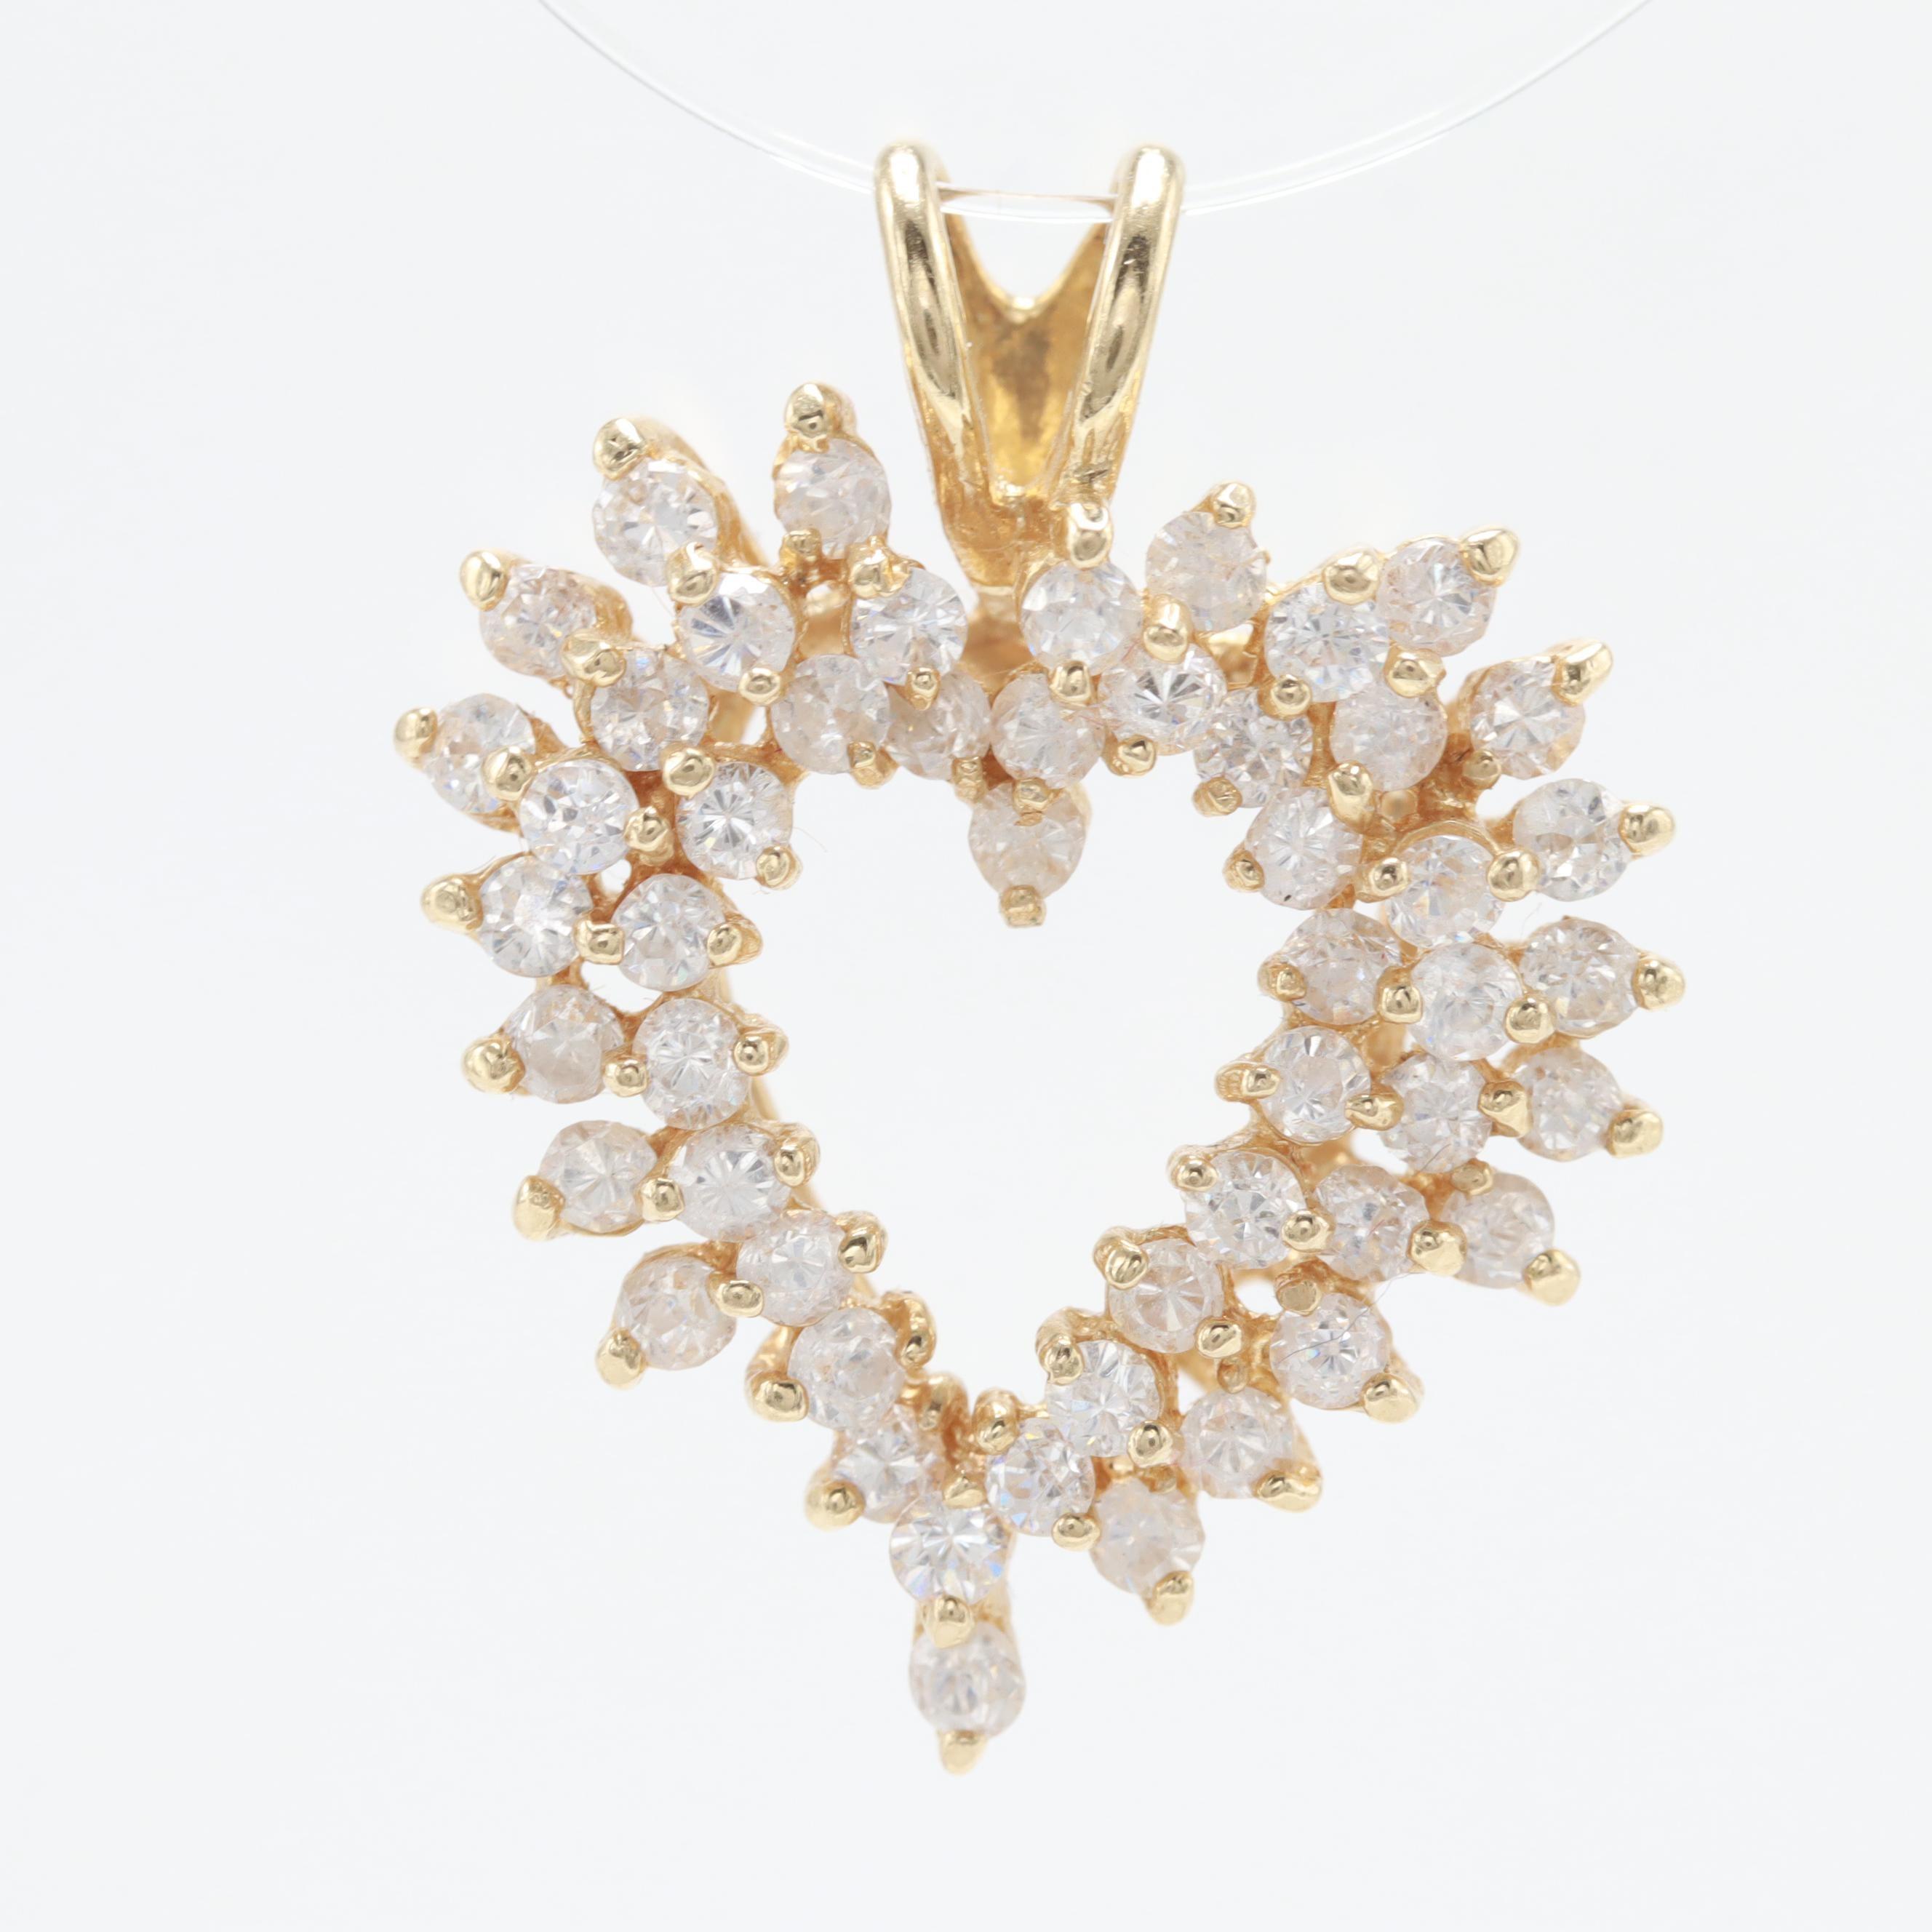 14K Yellow Gold Cubic Zirconia Heart Pendant